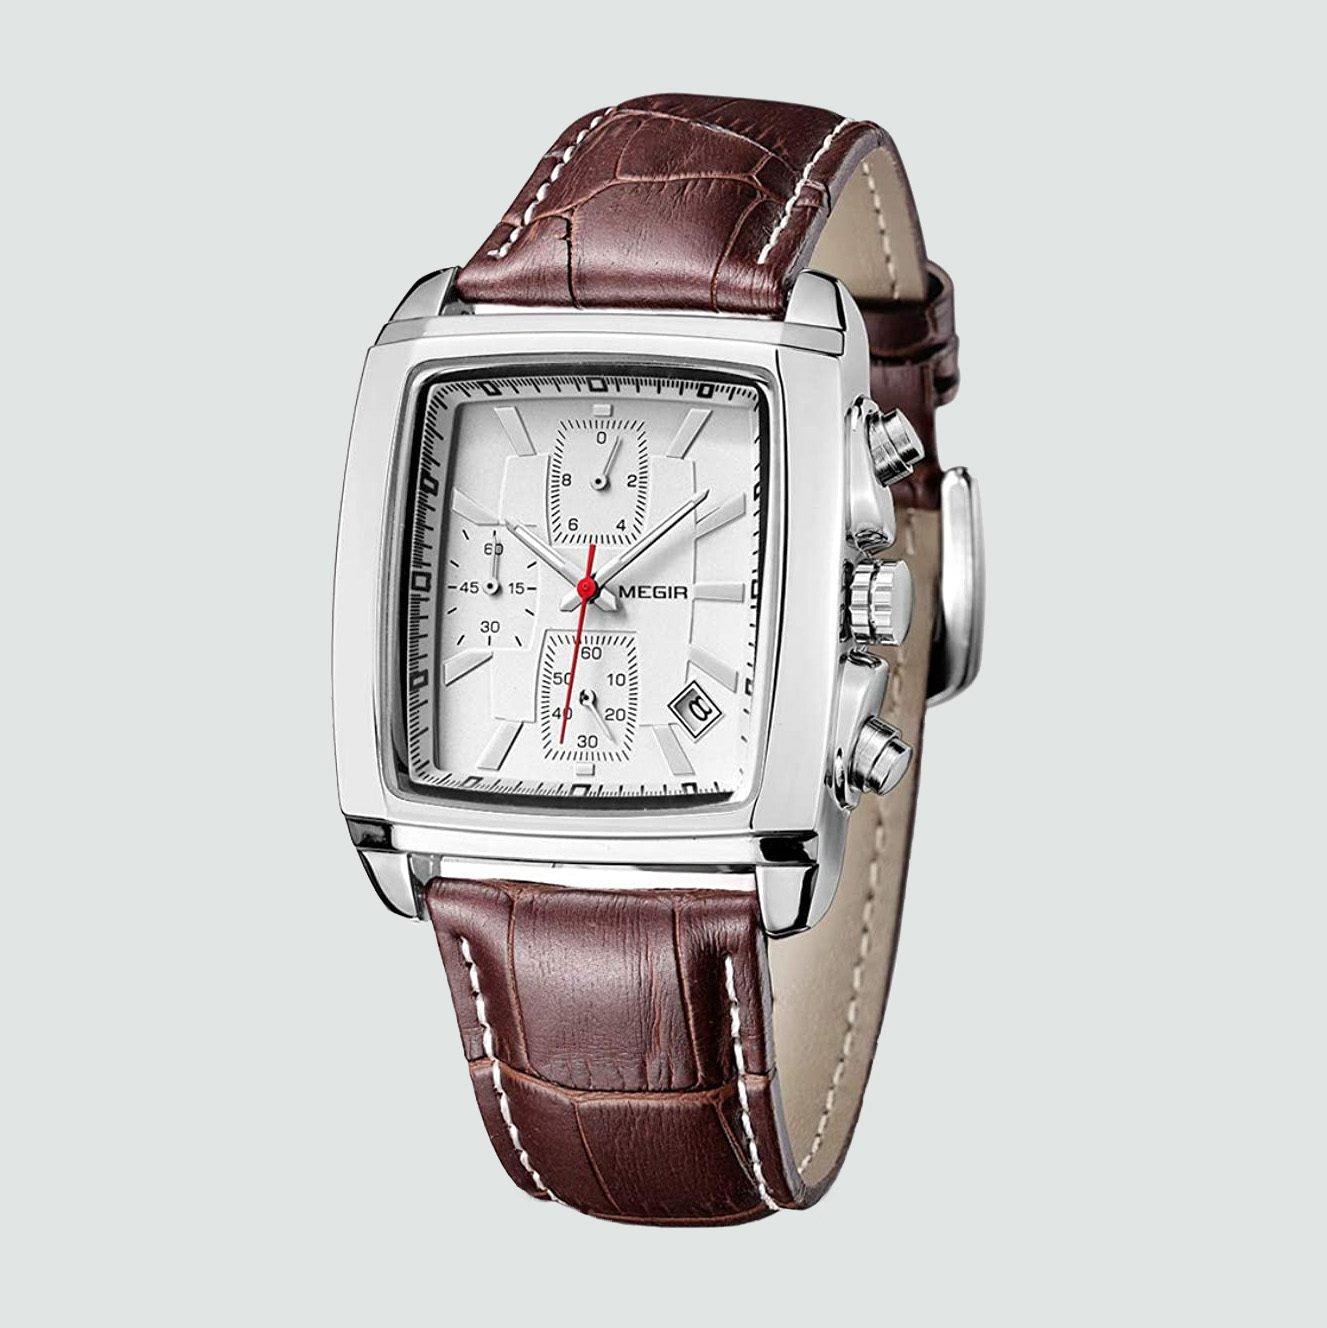 Megir Casual Analog Wristwatch